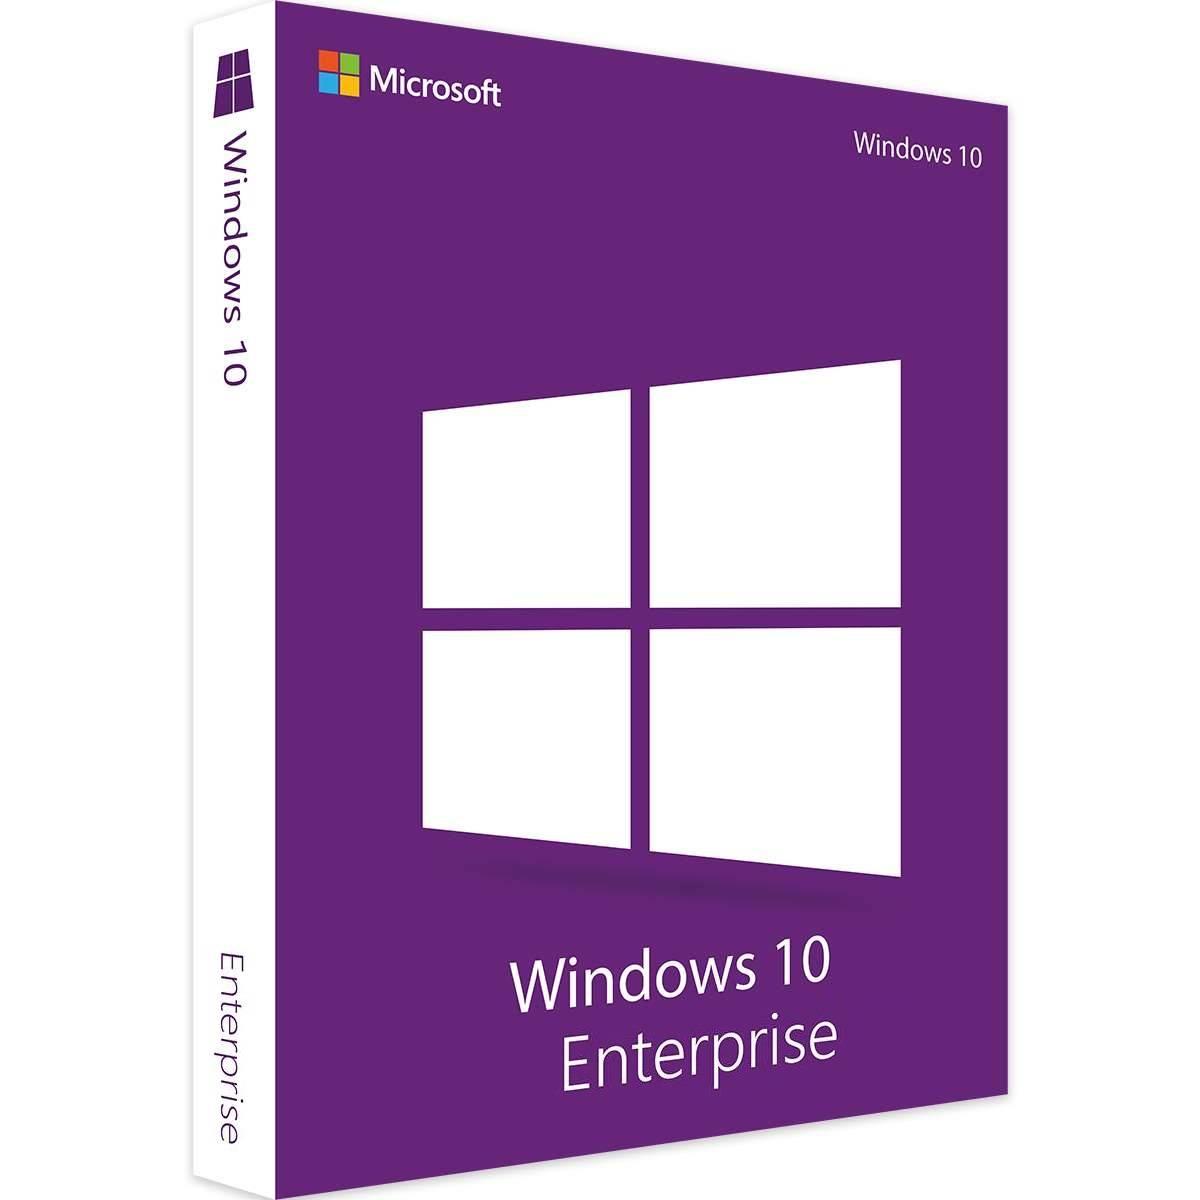 win-10-enterprise-ltsb_600x600@2x.jpg